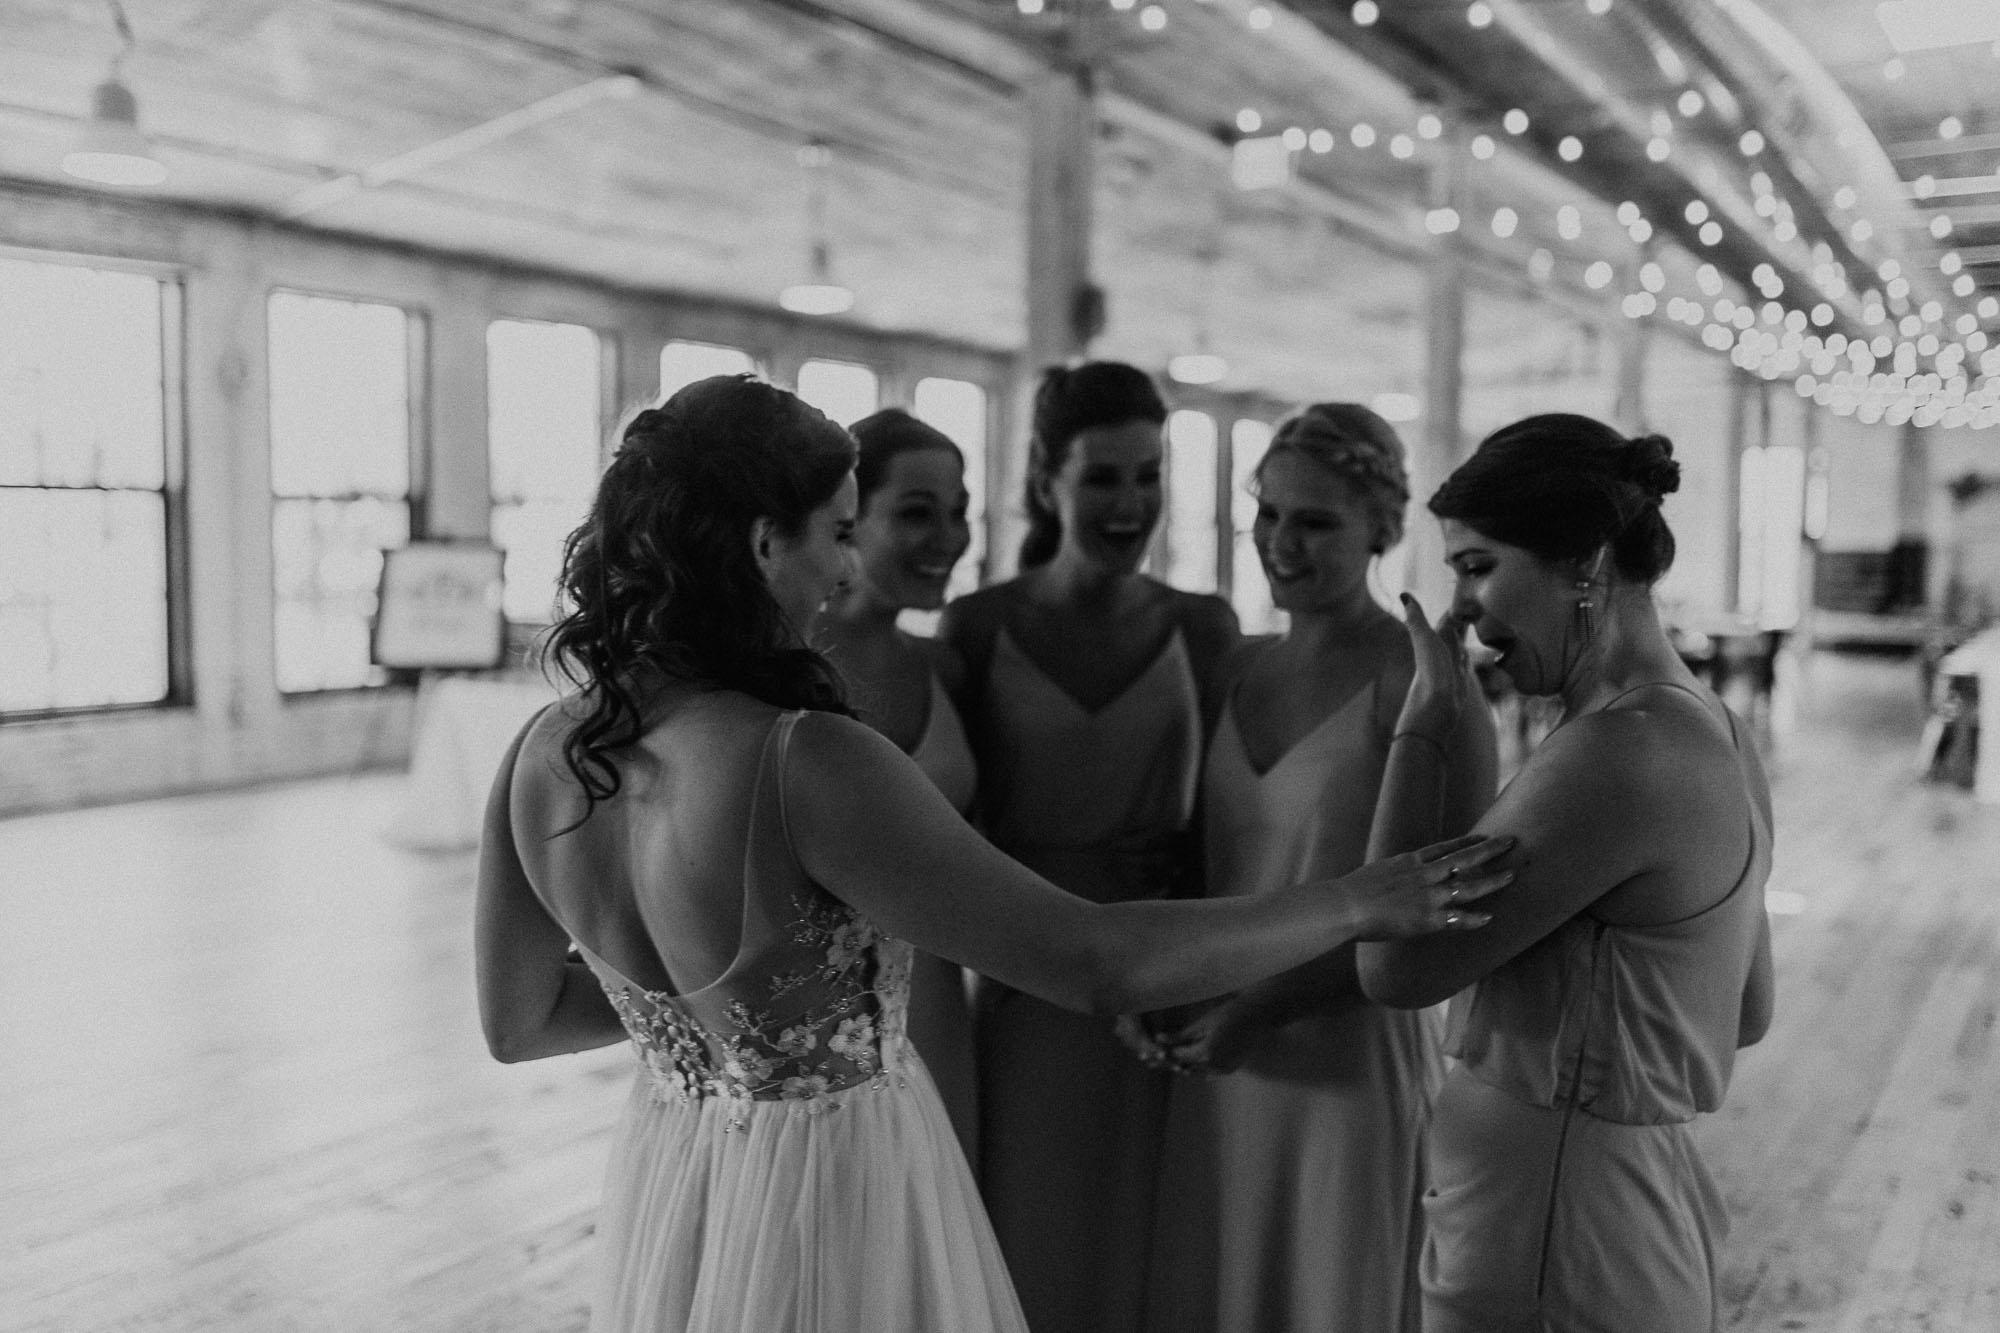 journeyman_distillery_wedding_photographer_chicago_il_wright_photographs-1013.jpg